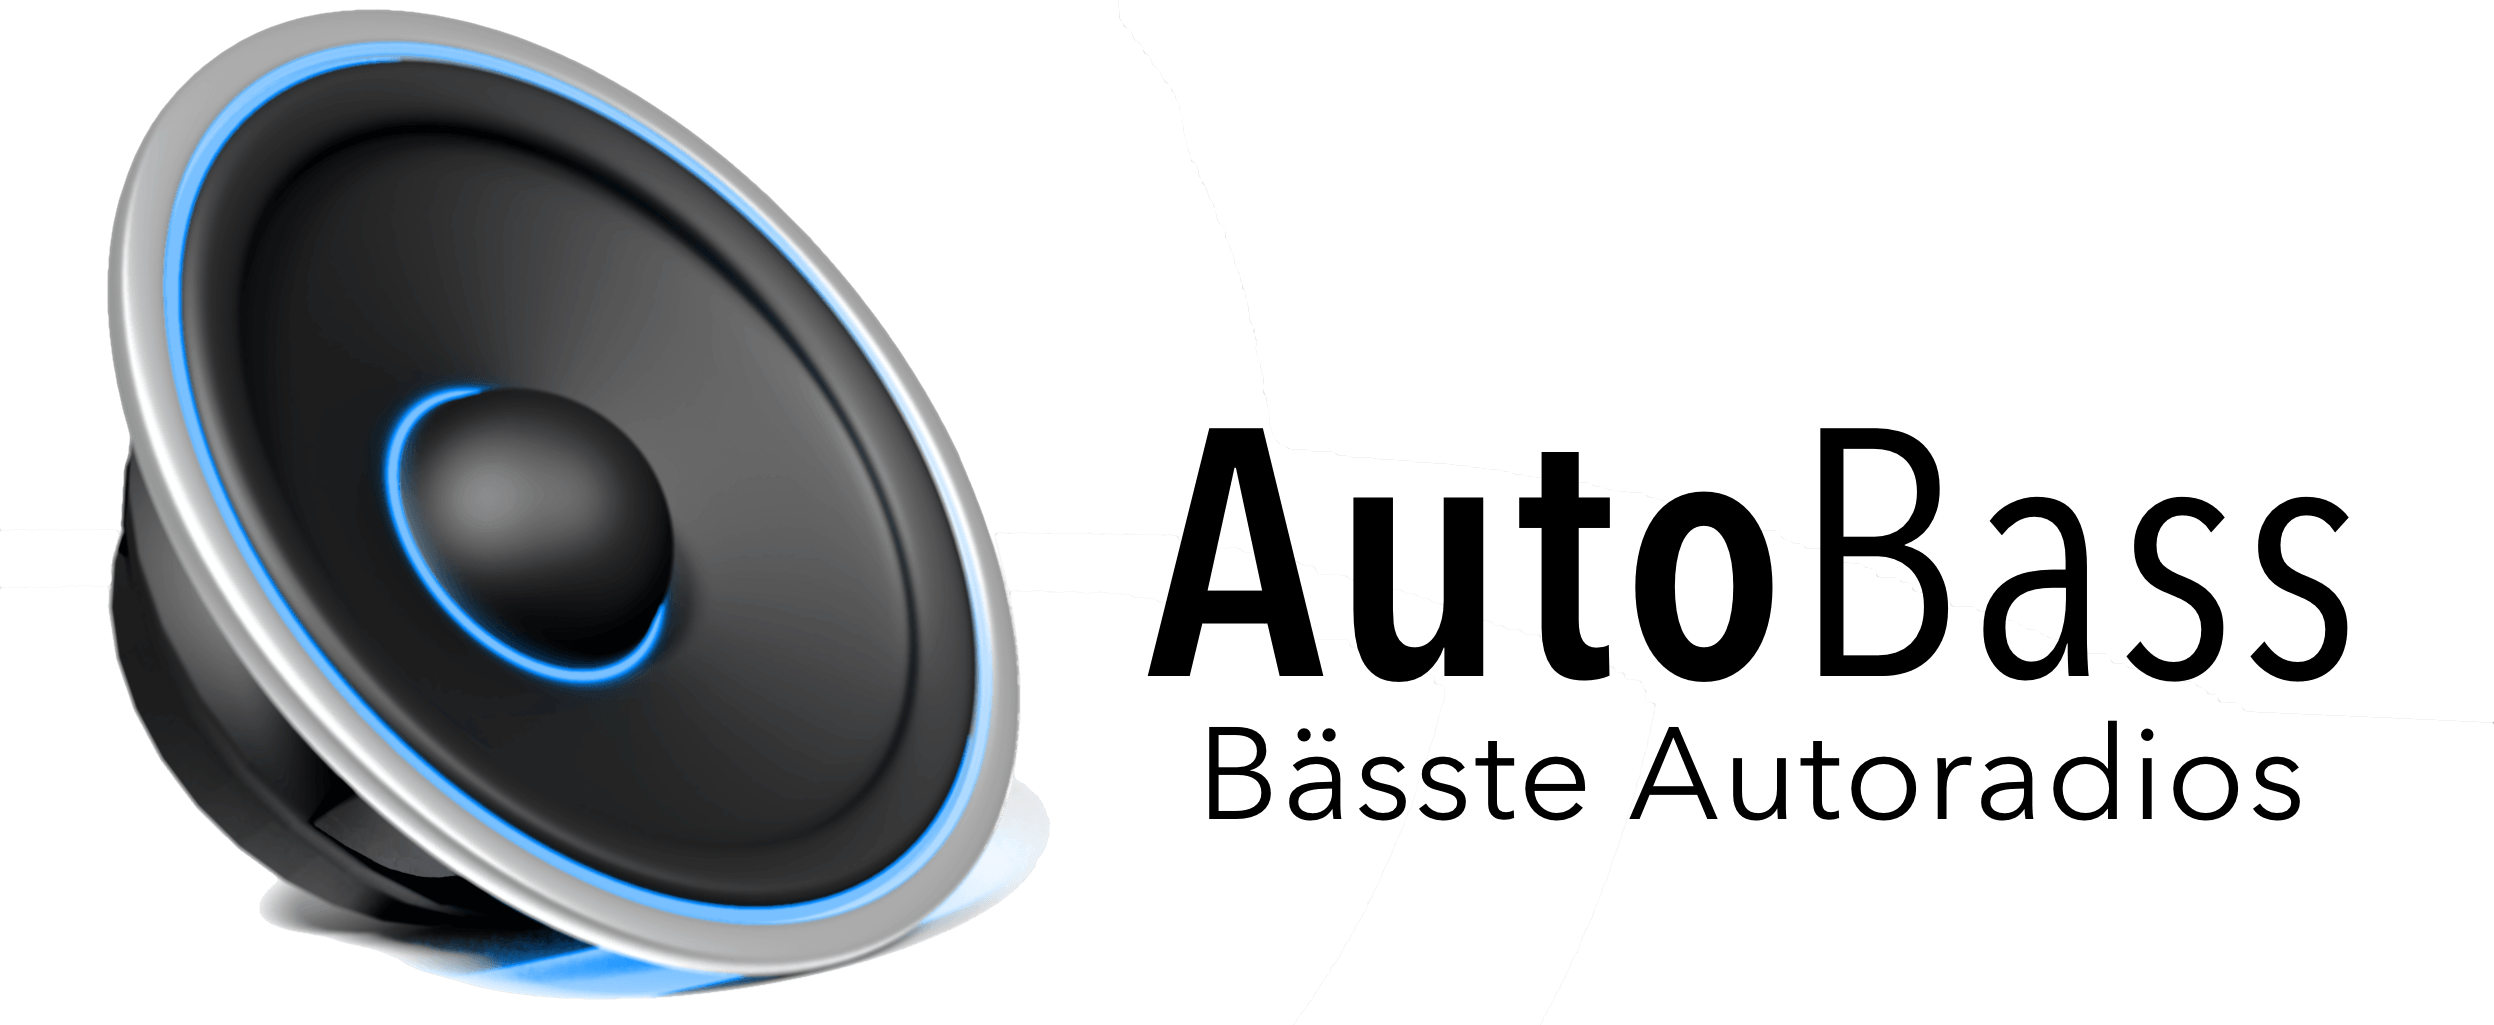 Auto Bass Logo Autoradio